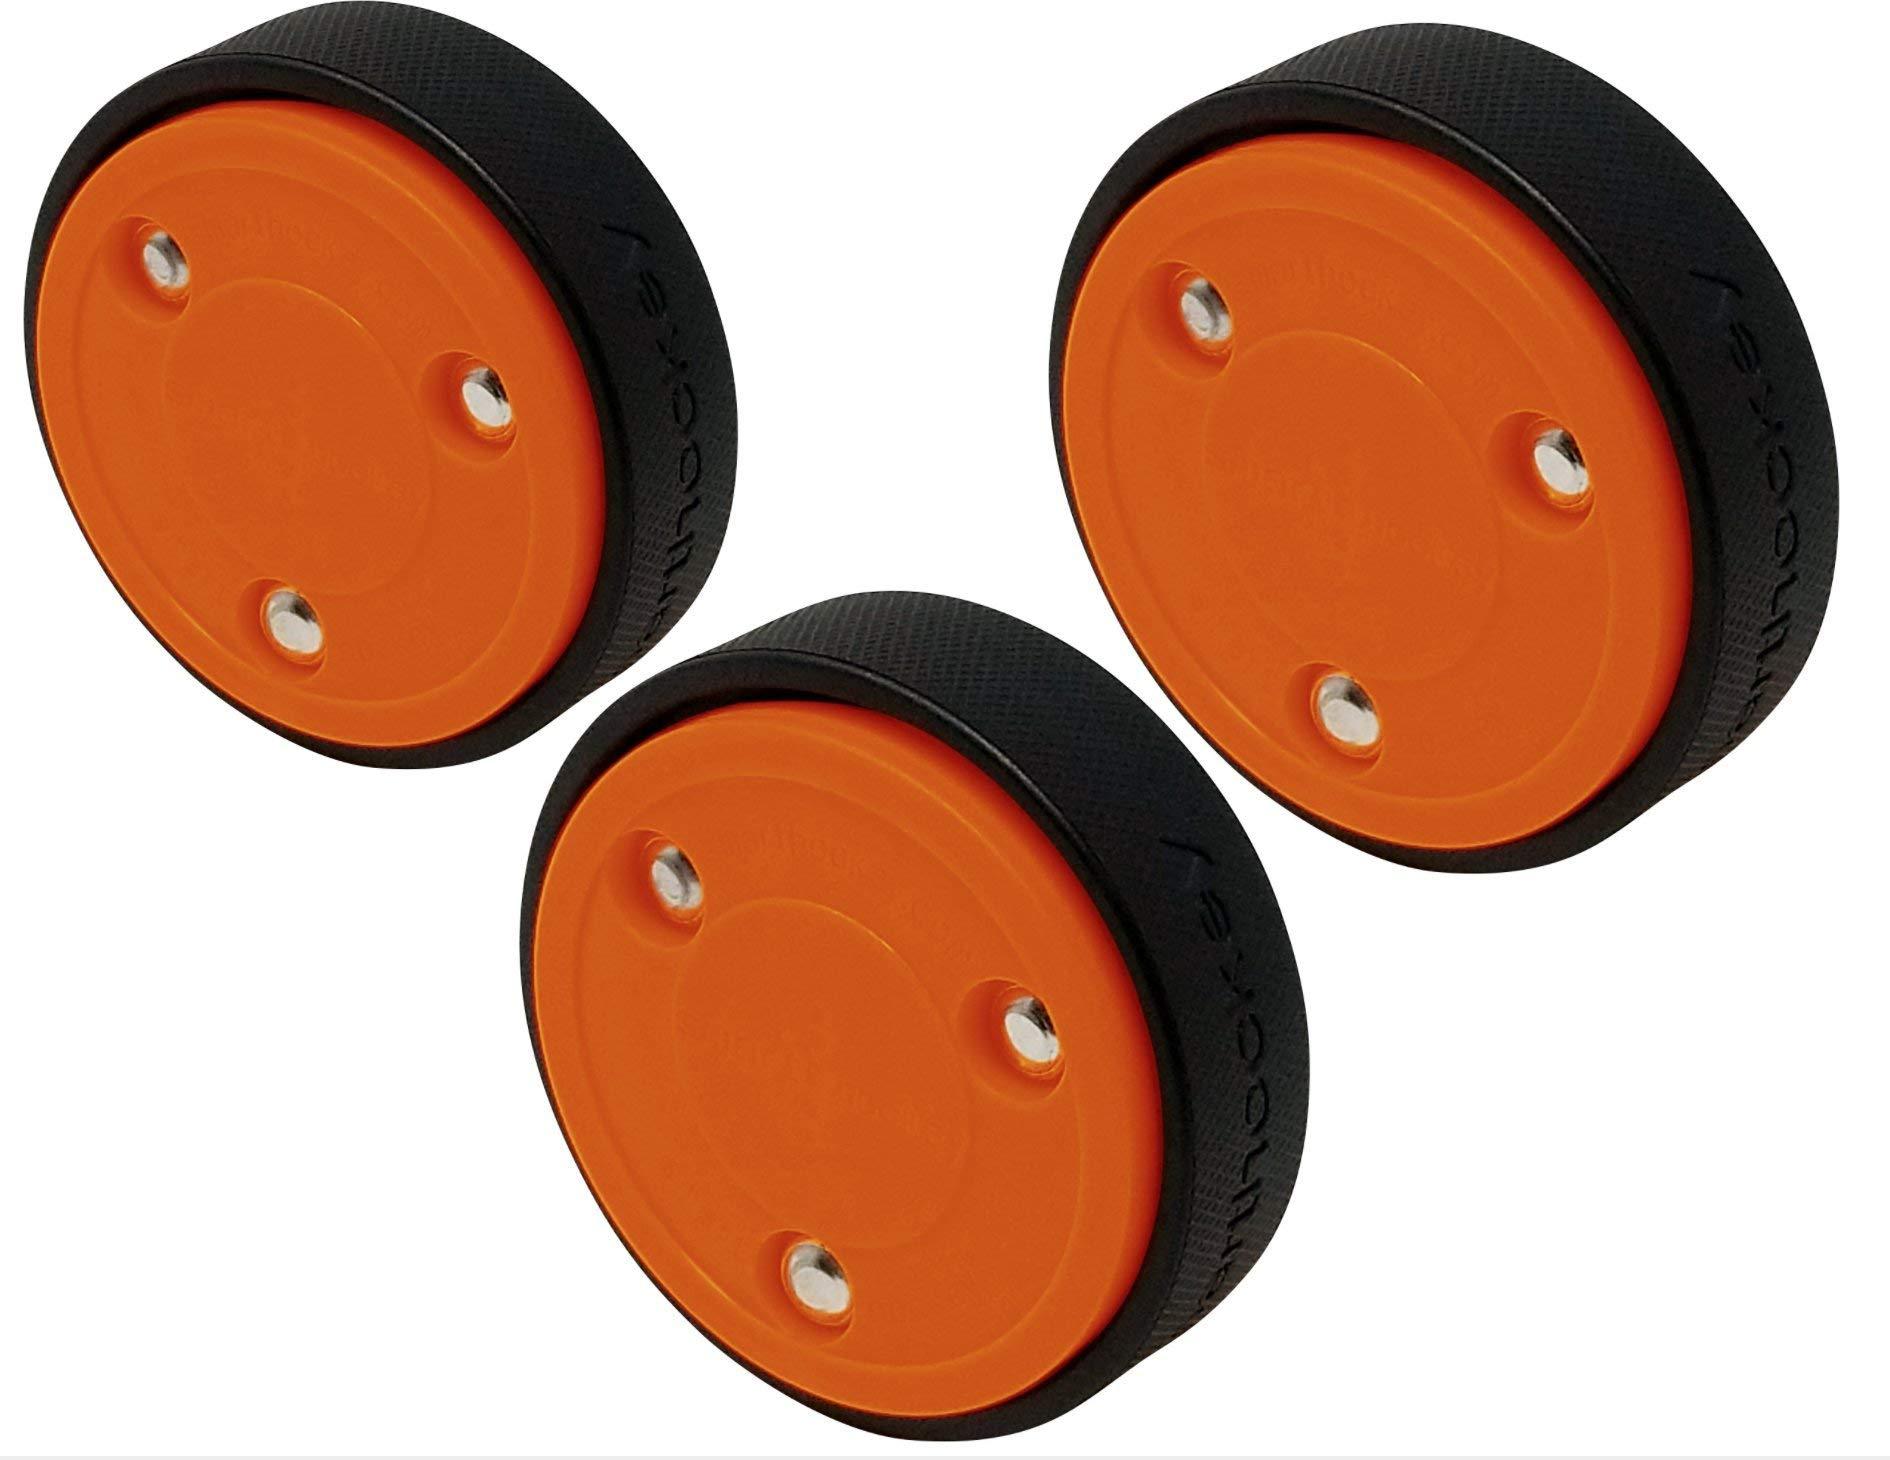 Smarthockey 4oz Slider Hockey Training Speed Puck - Orange 3-Pack